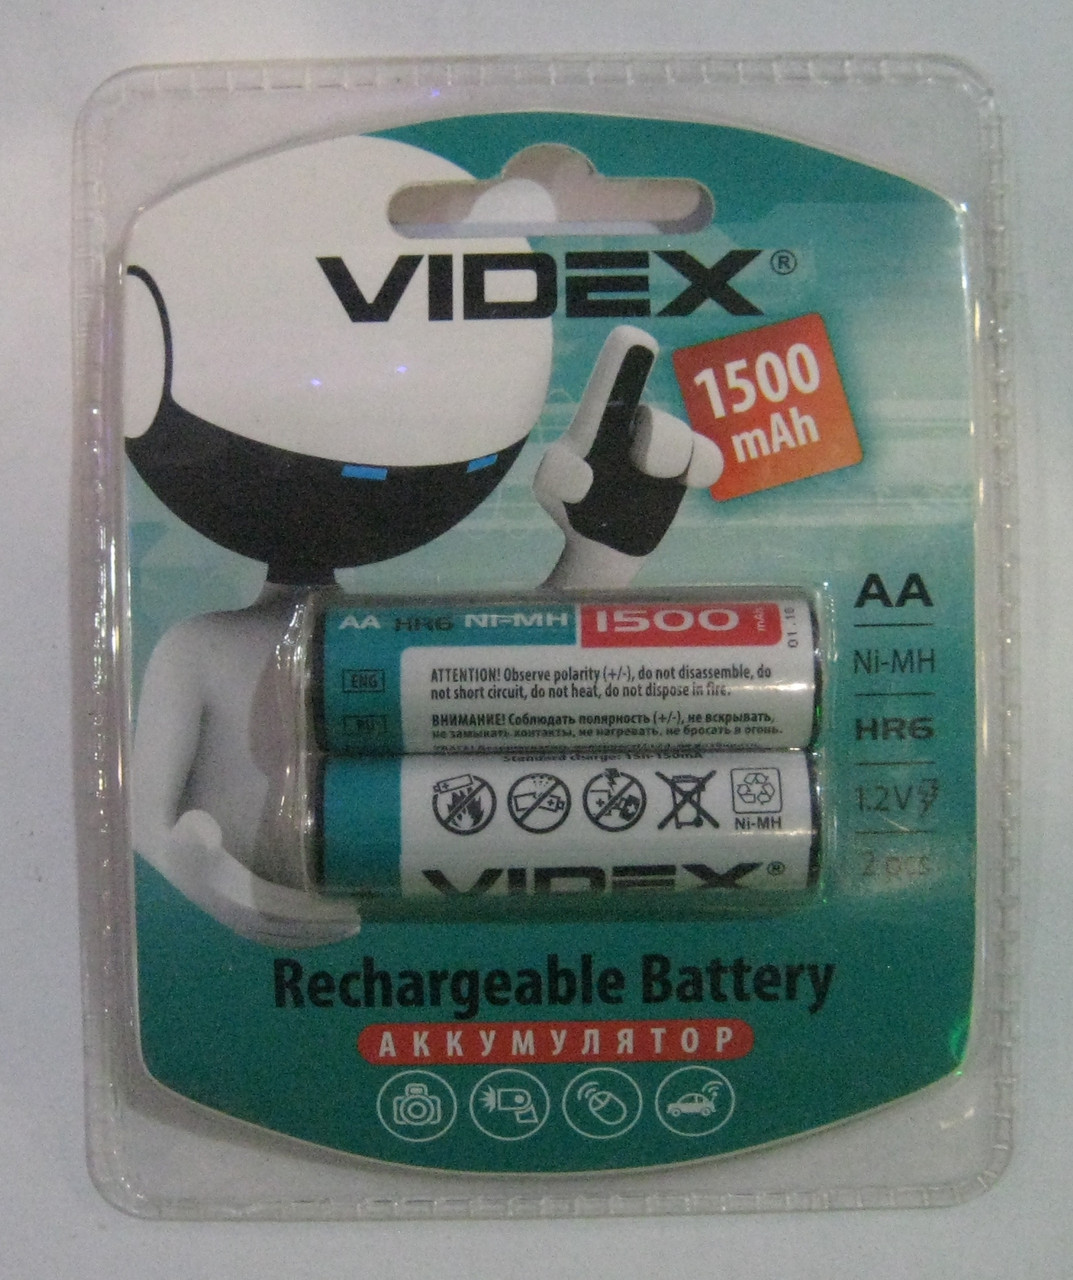 Аккумуляторы Videx AA 1500 mAh (палец)